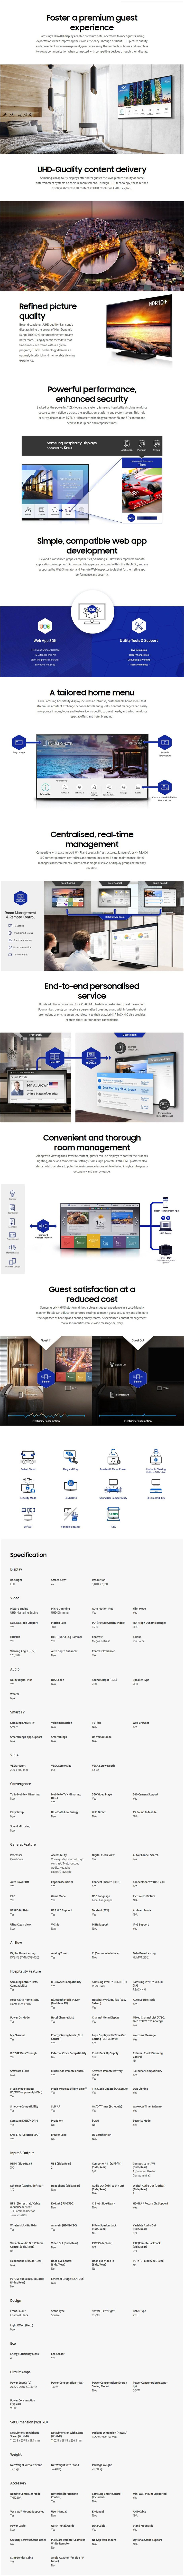 "Samsung HG49AJ690U 49"" 4K UHD 10/7 Commercial Hospitality Displays - Overview 1"